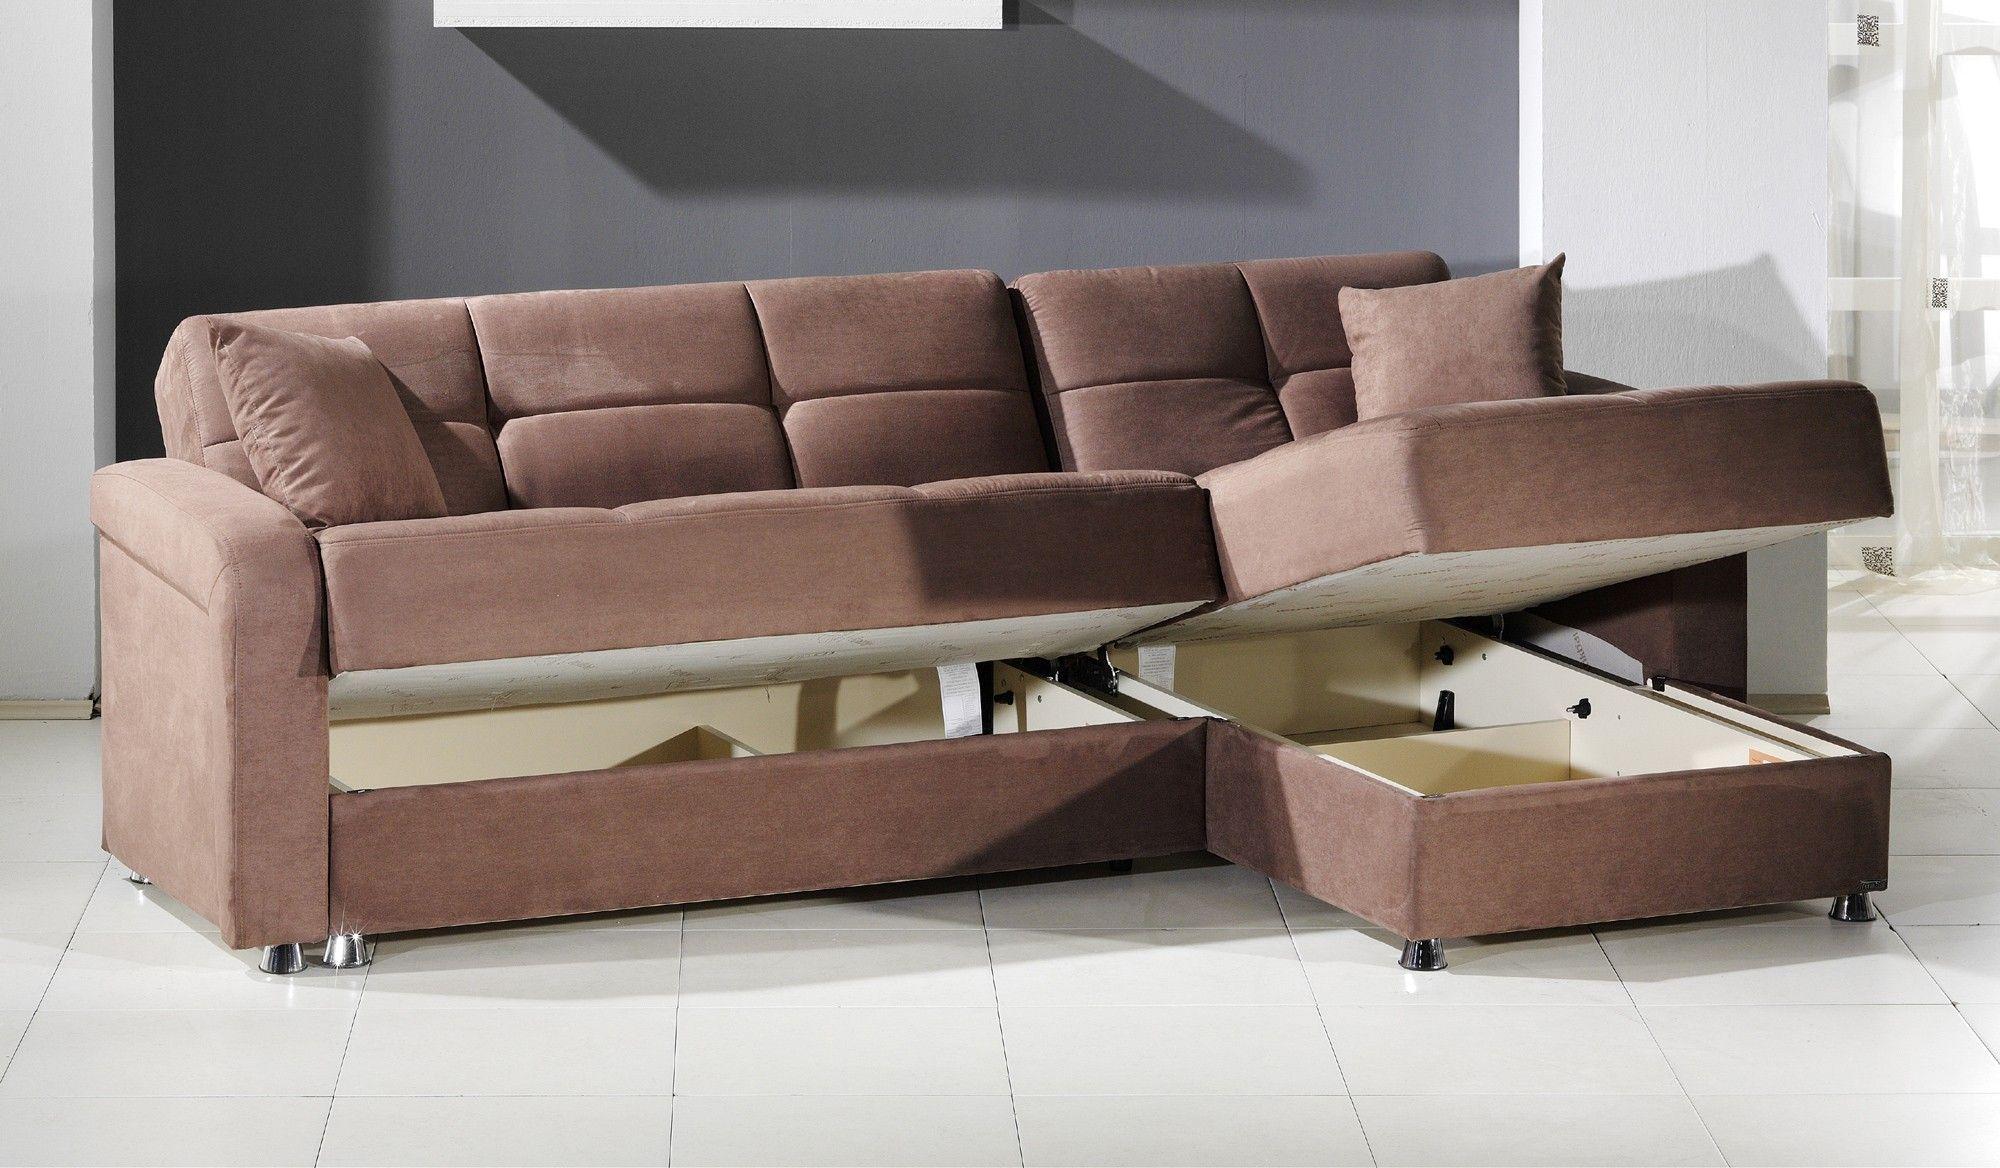 Vision Sectional Sofa Sleeper Hd Small Sleeper Sofa